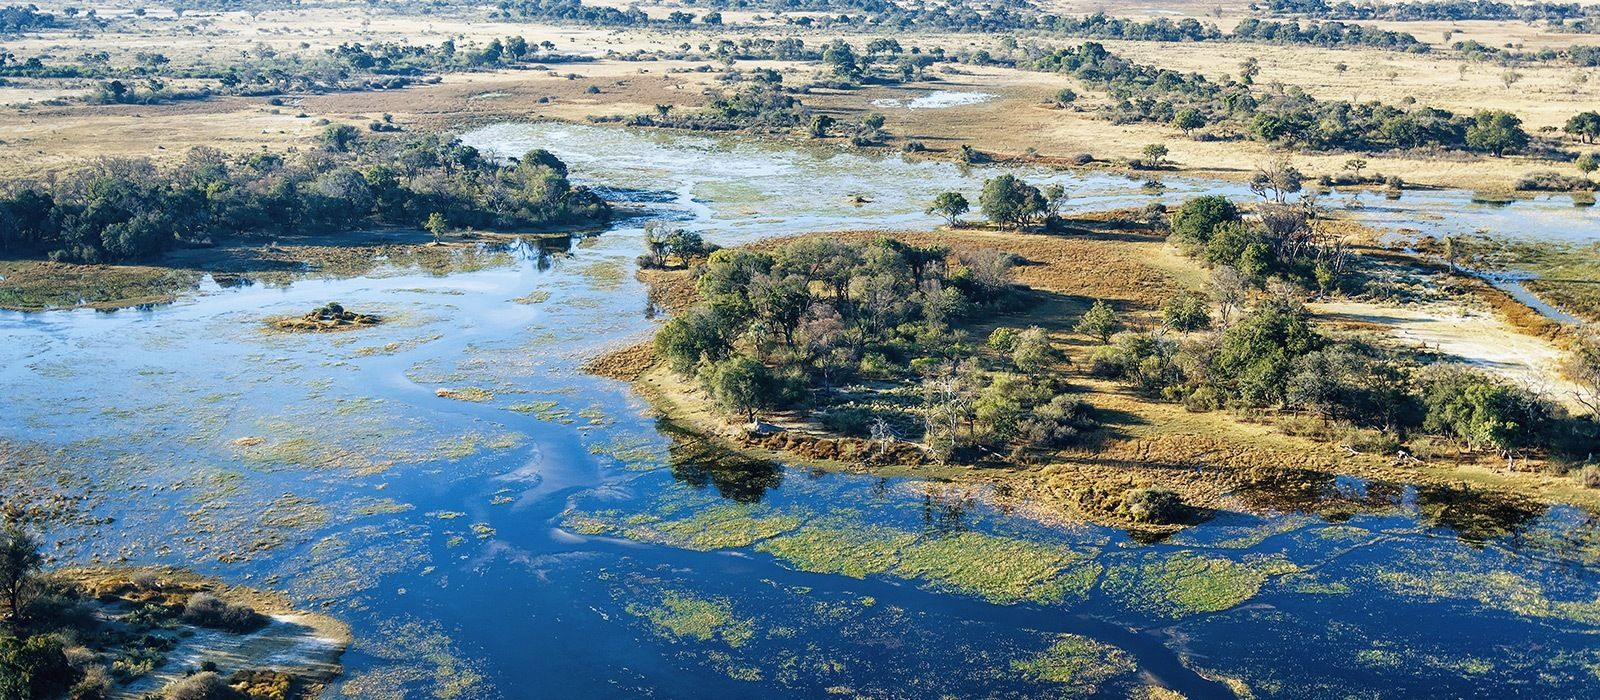 Südafrika, Sambia & Botswana: Safaris, Wein und Wasserfälle Urlaub 5